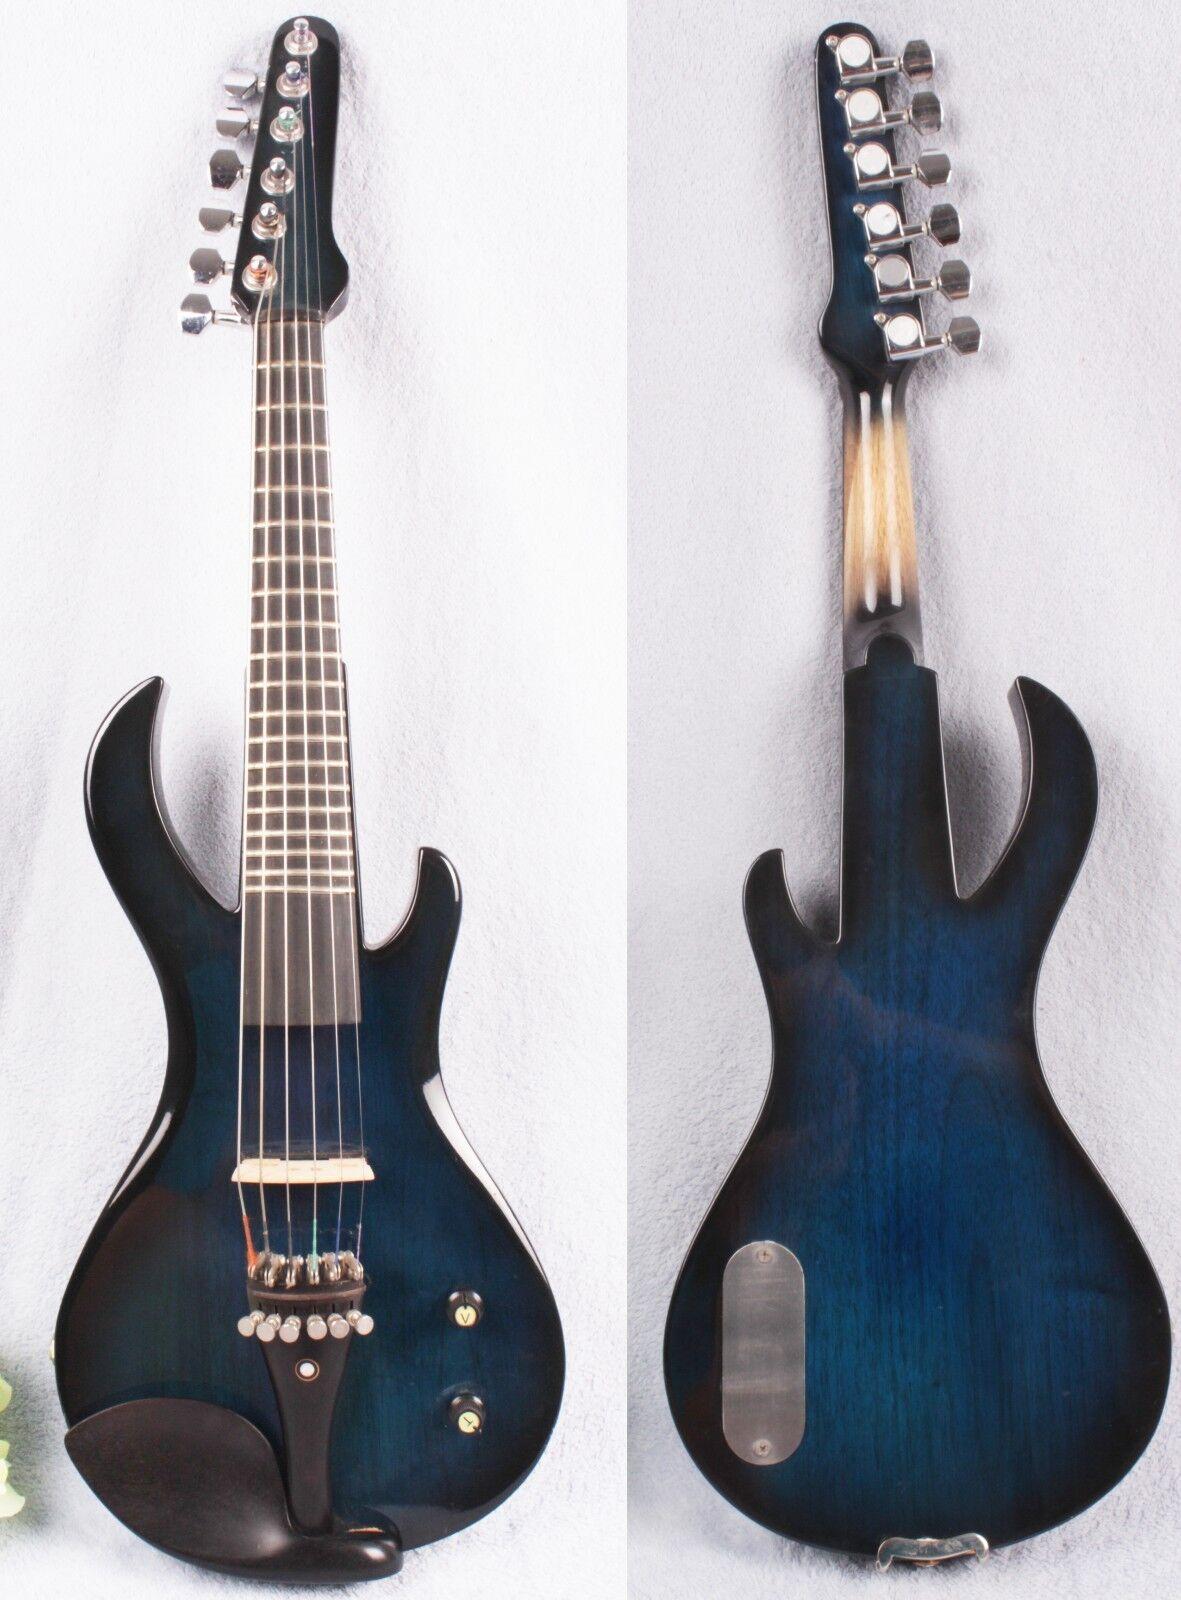 New 6 string 4 4 Electric Violin Fretboard guitar shape Violin Bow Case bluee